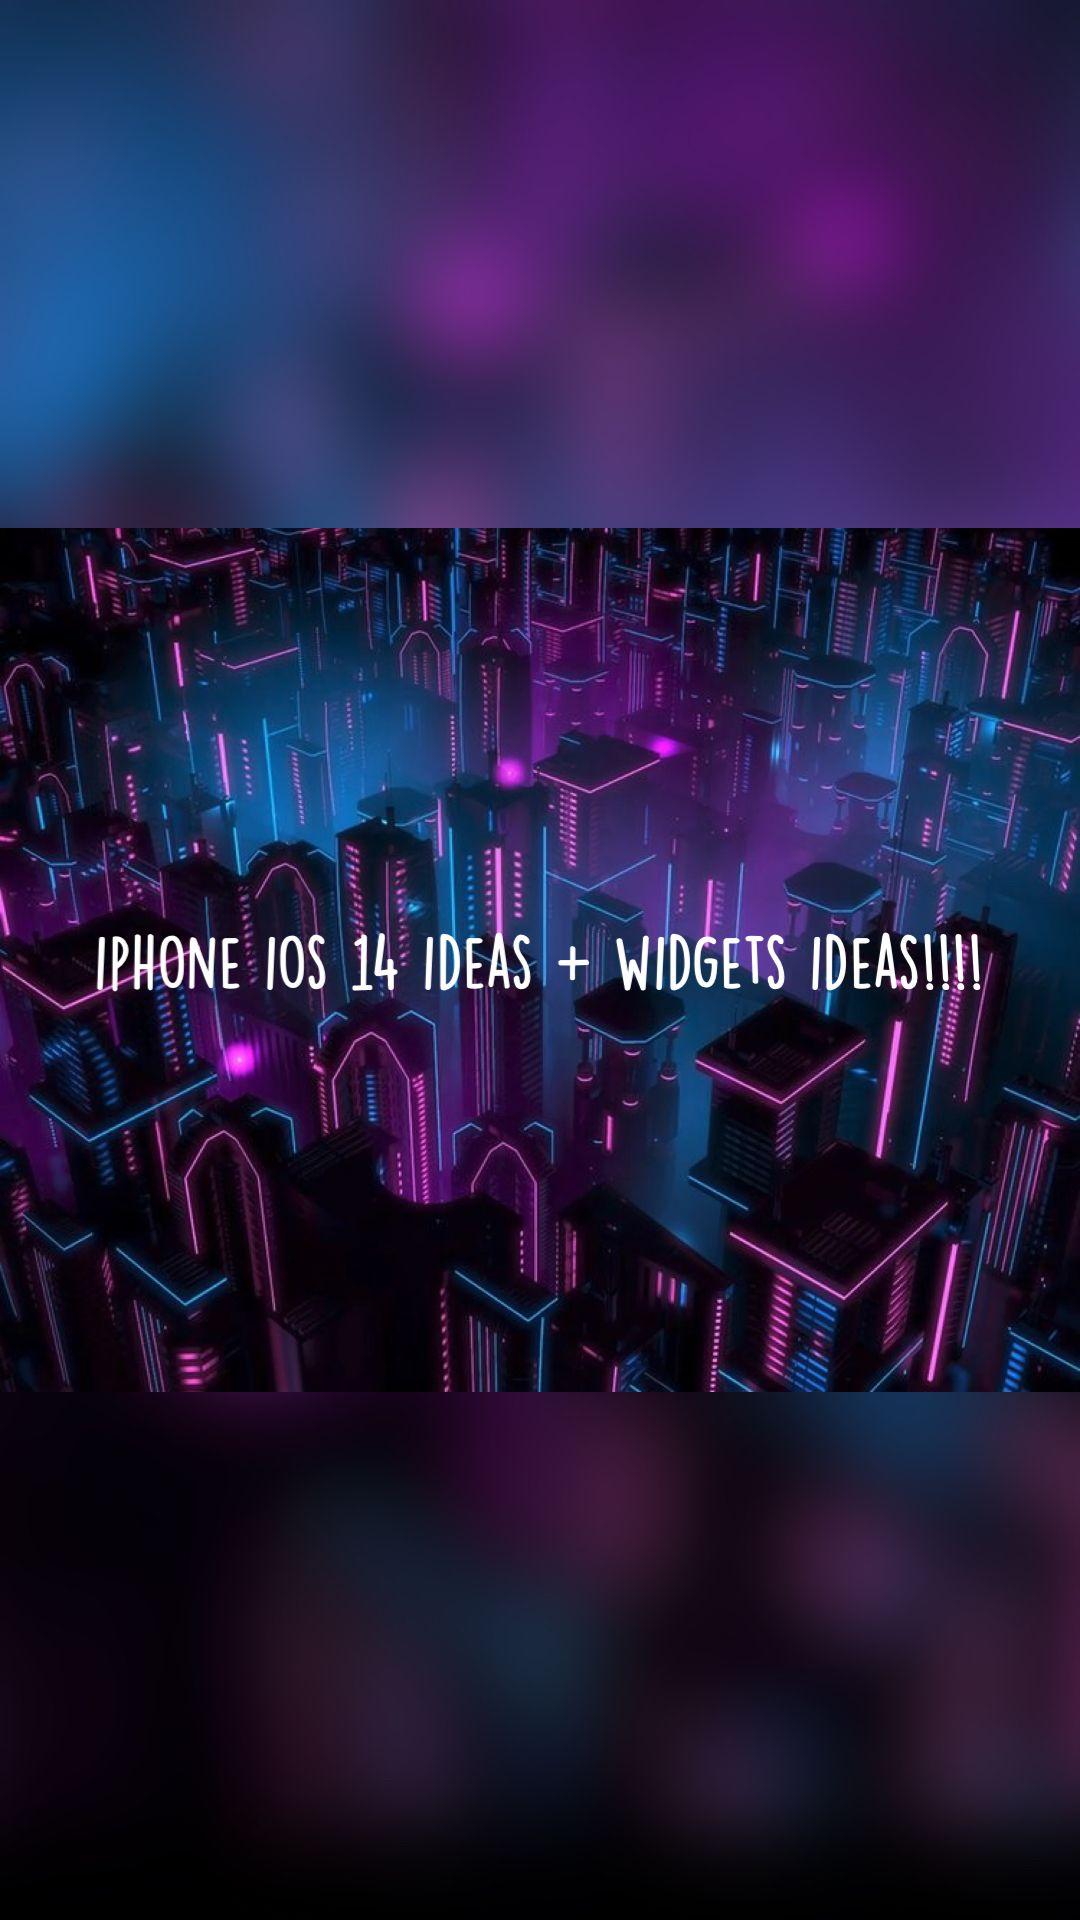 iphone ios 14 ideas + widgets ideas!!!!